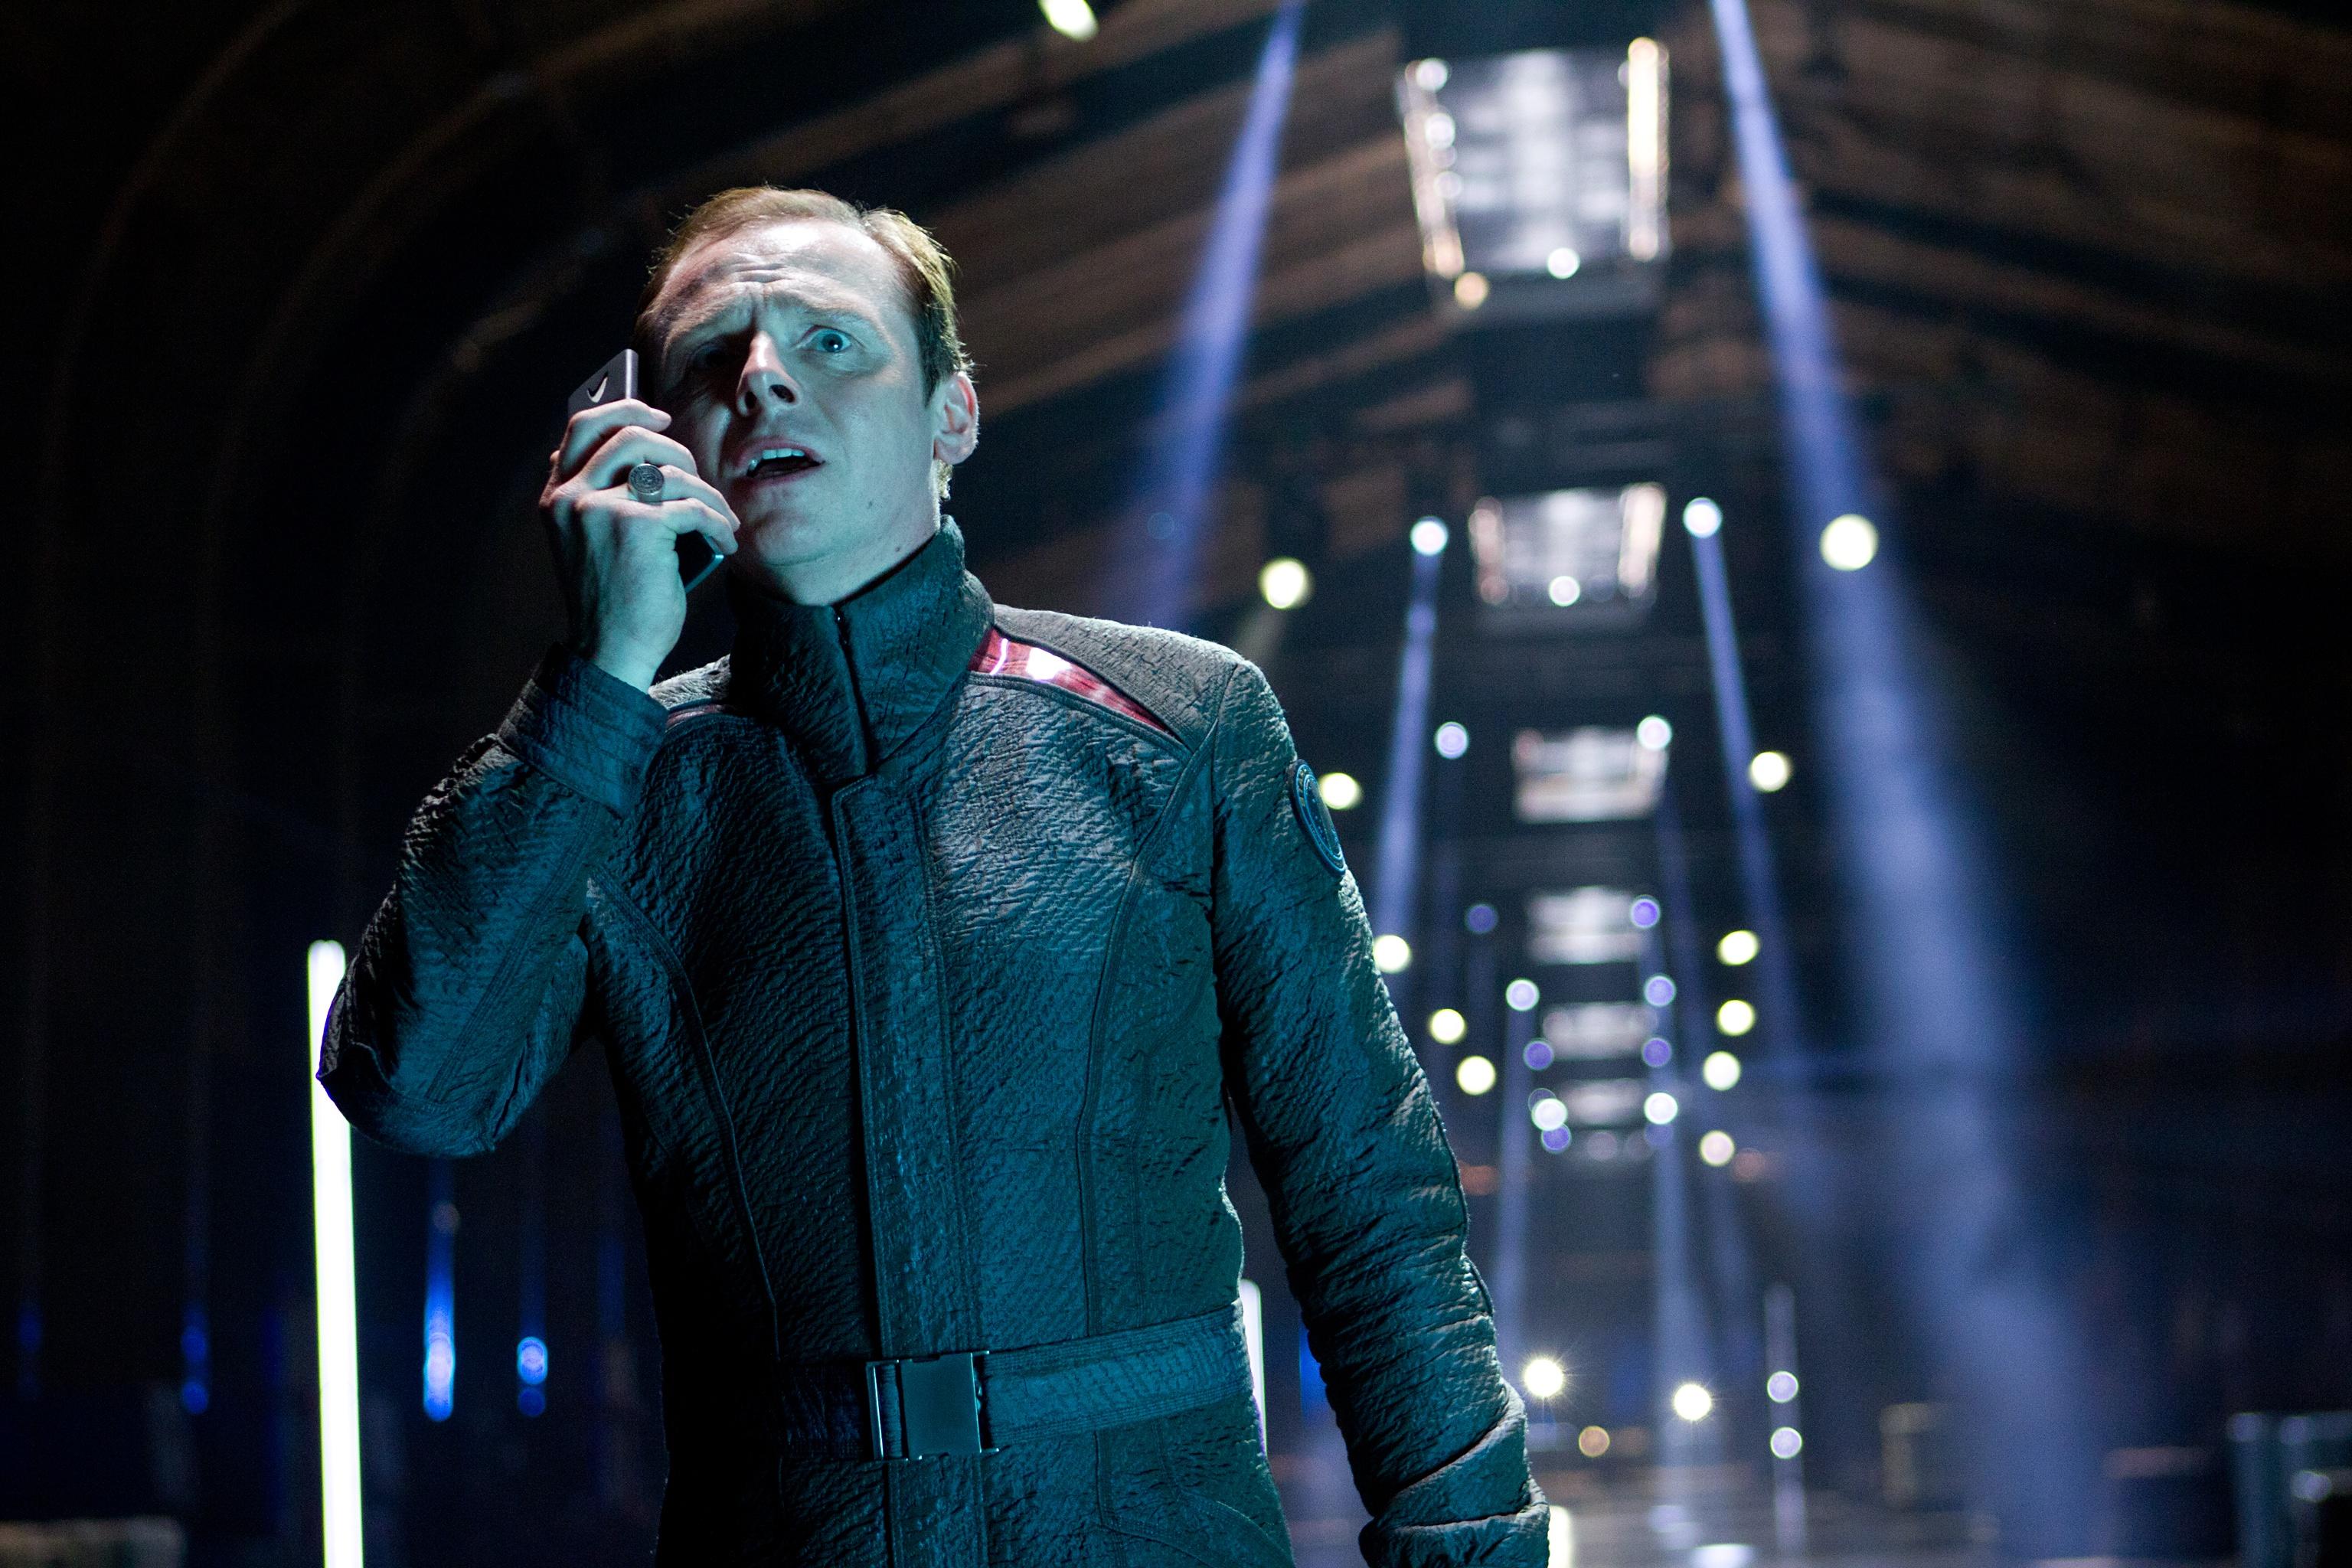 Star Trek Into Darkness Preview - Scotty